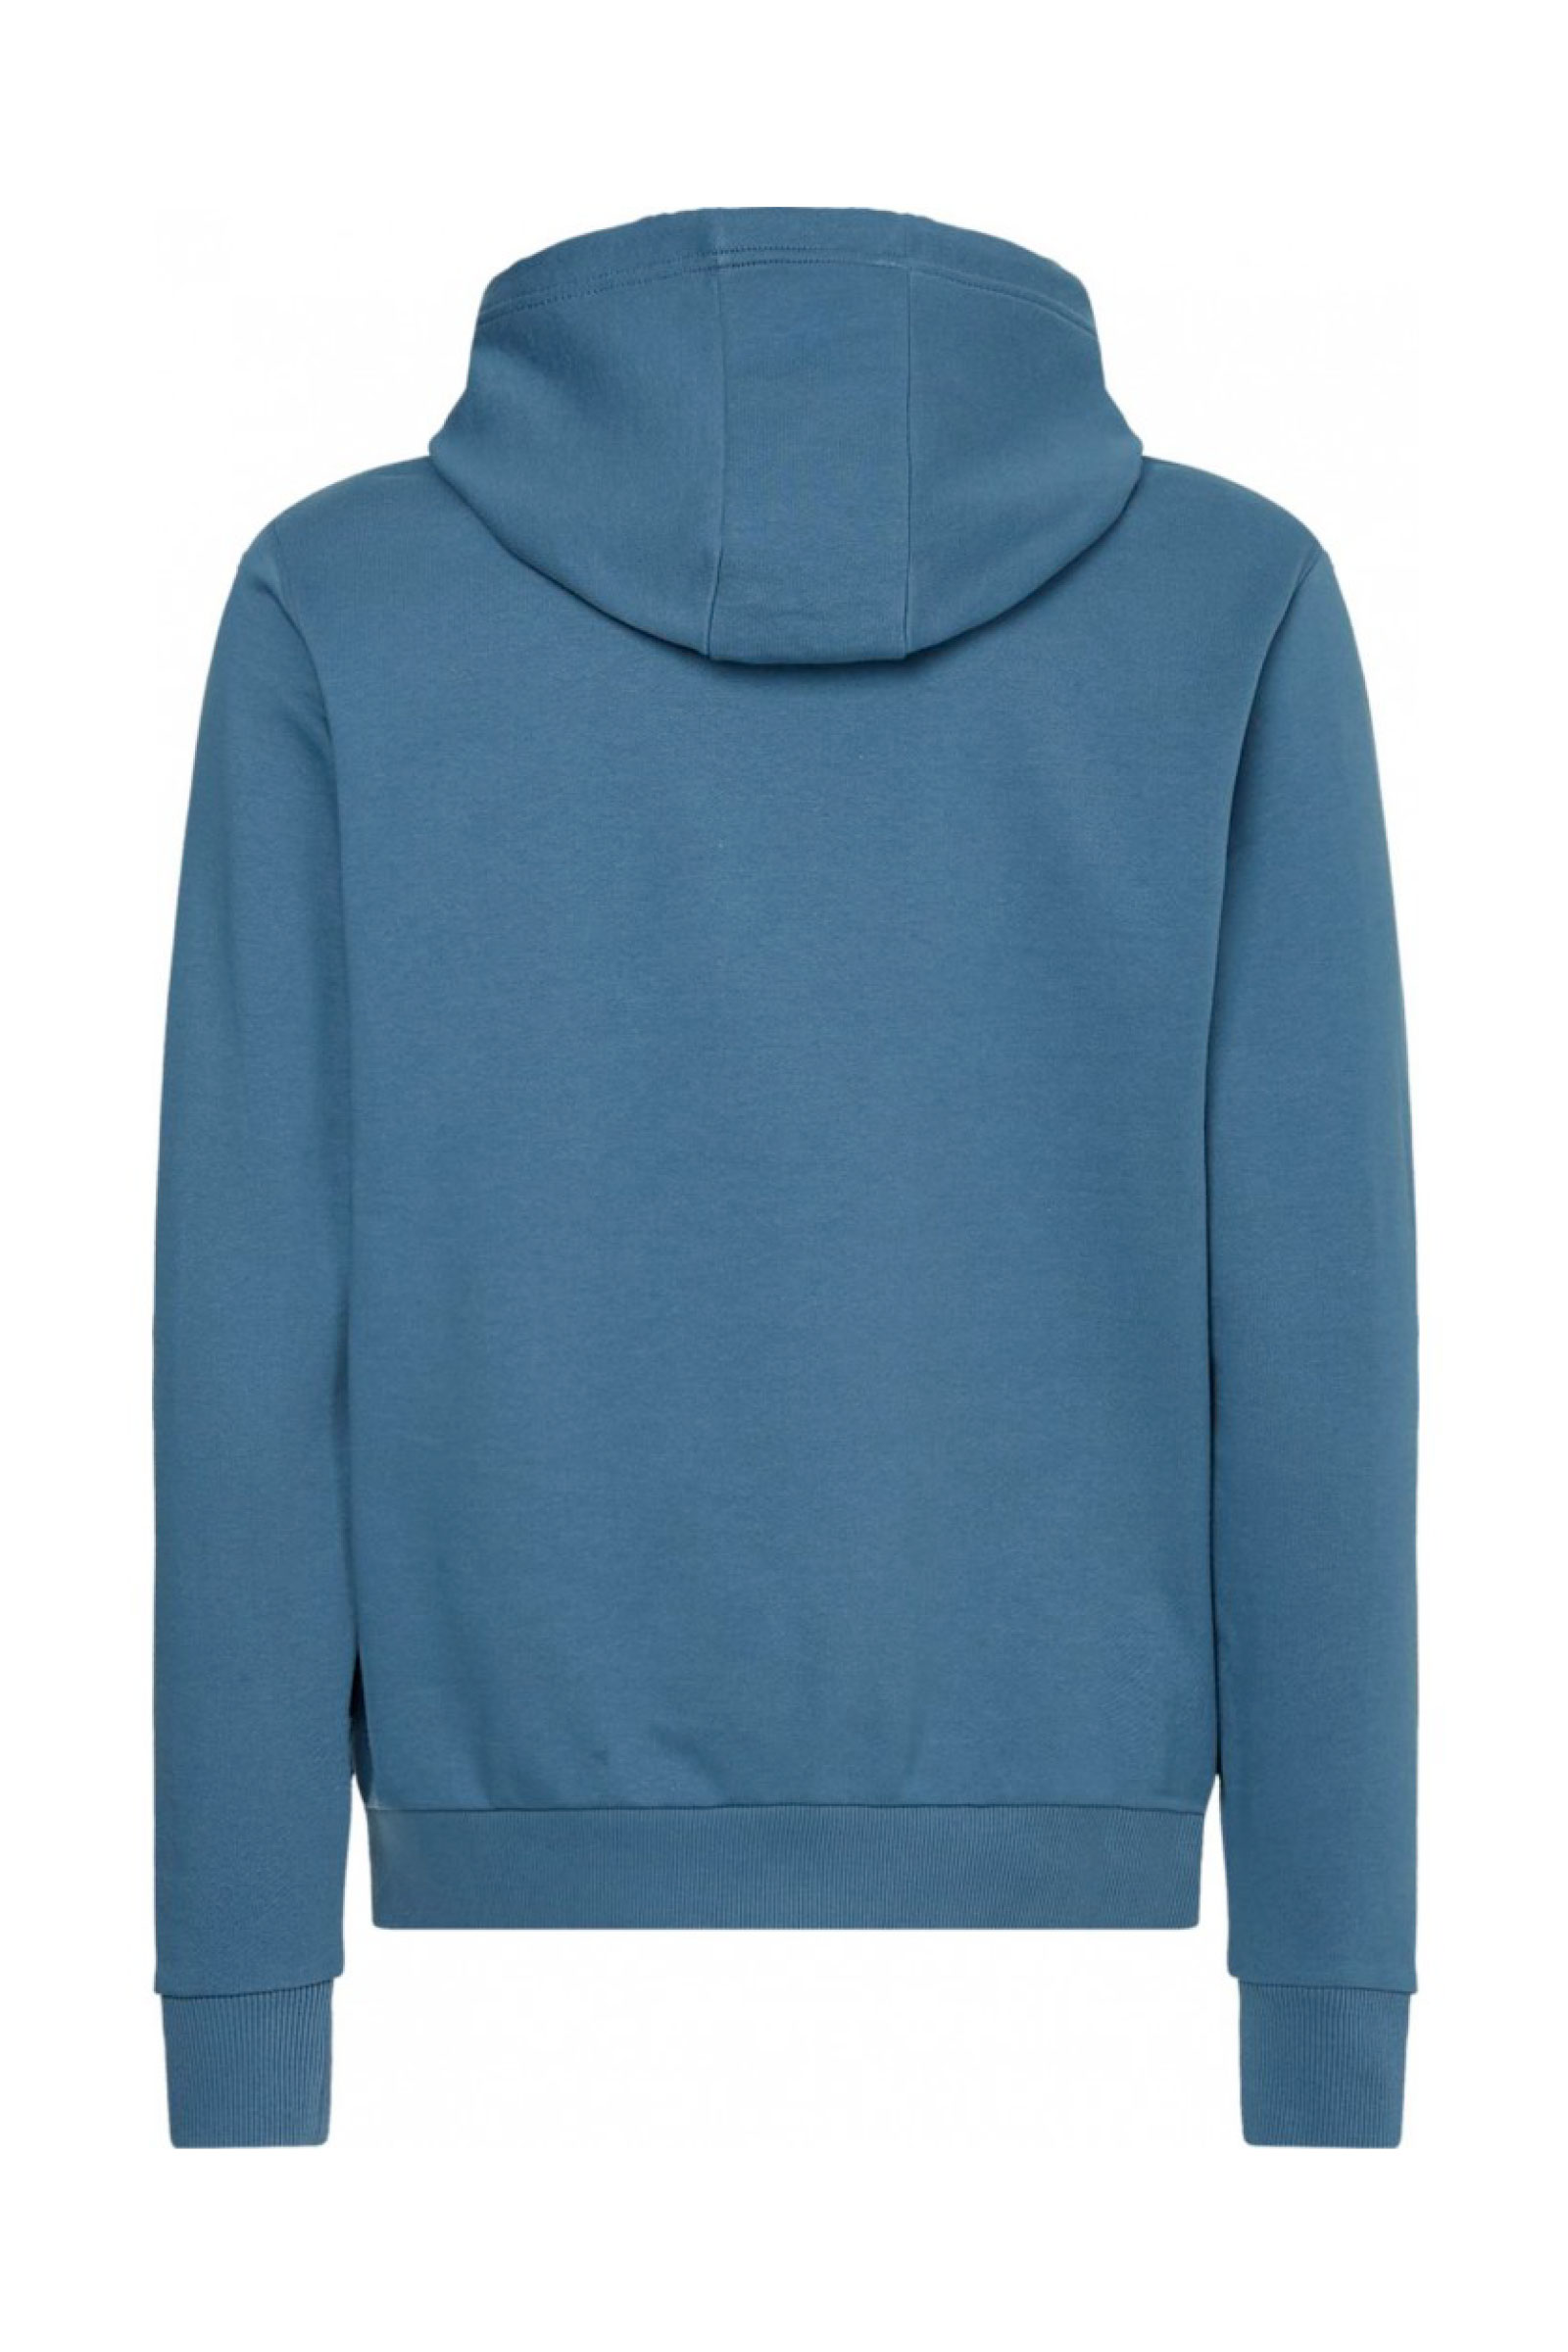 CALVIN KLEIN Men's Sweater CALVIN KLEIN | Sweatshirt | K10K107033CJ1